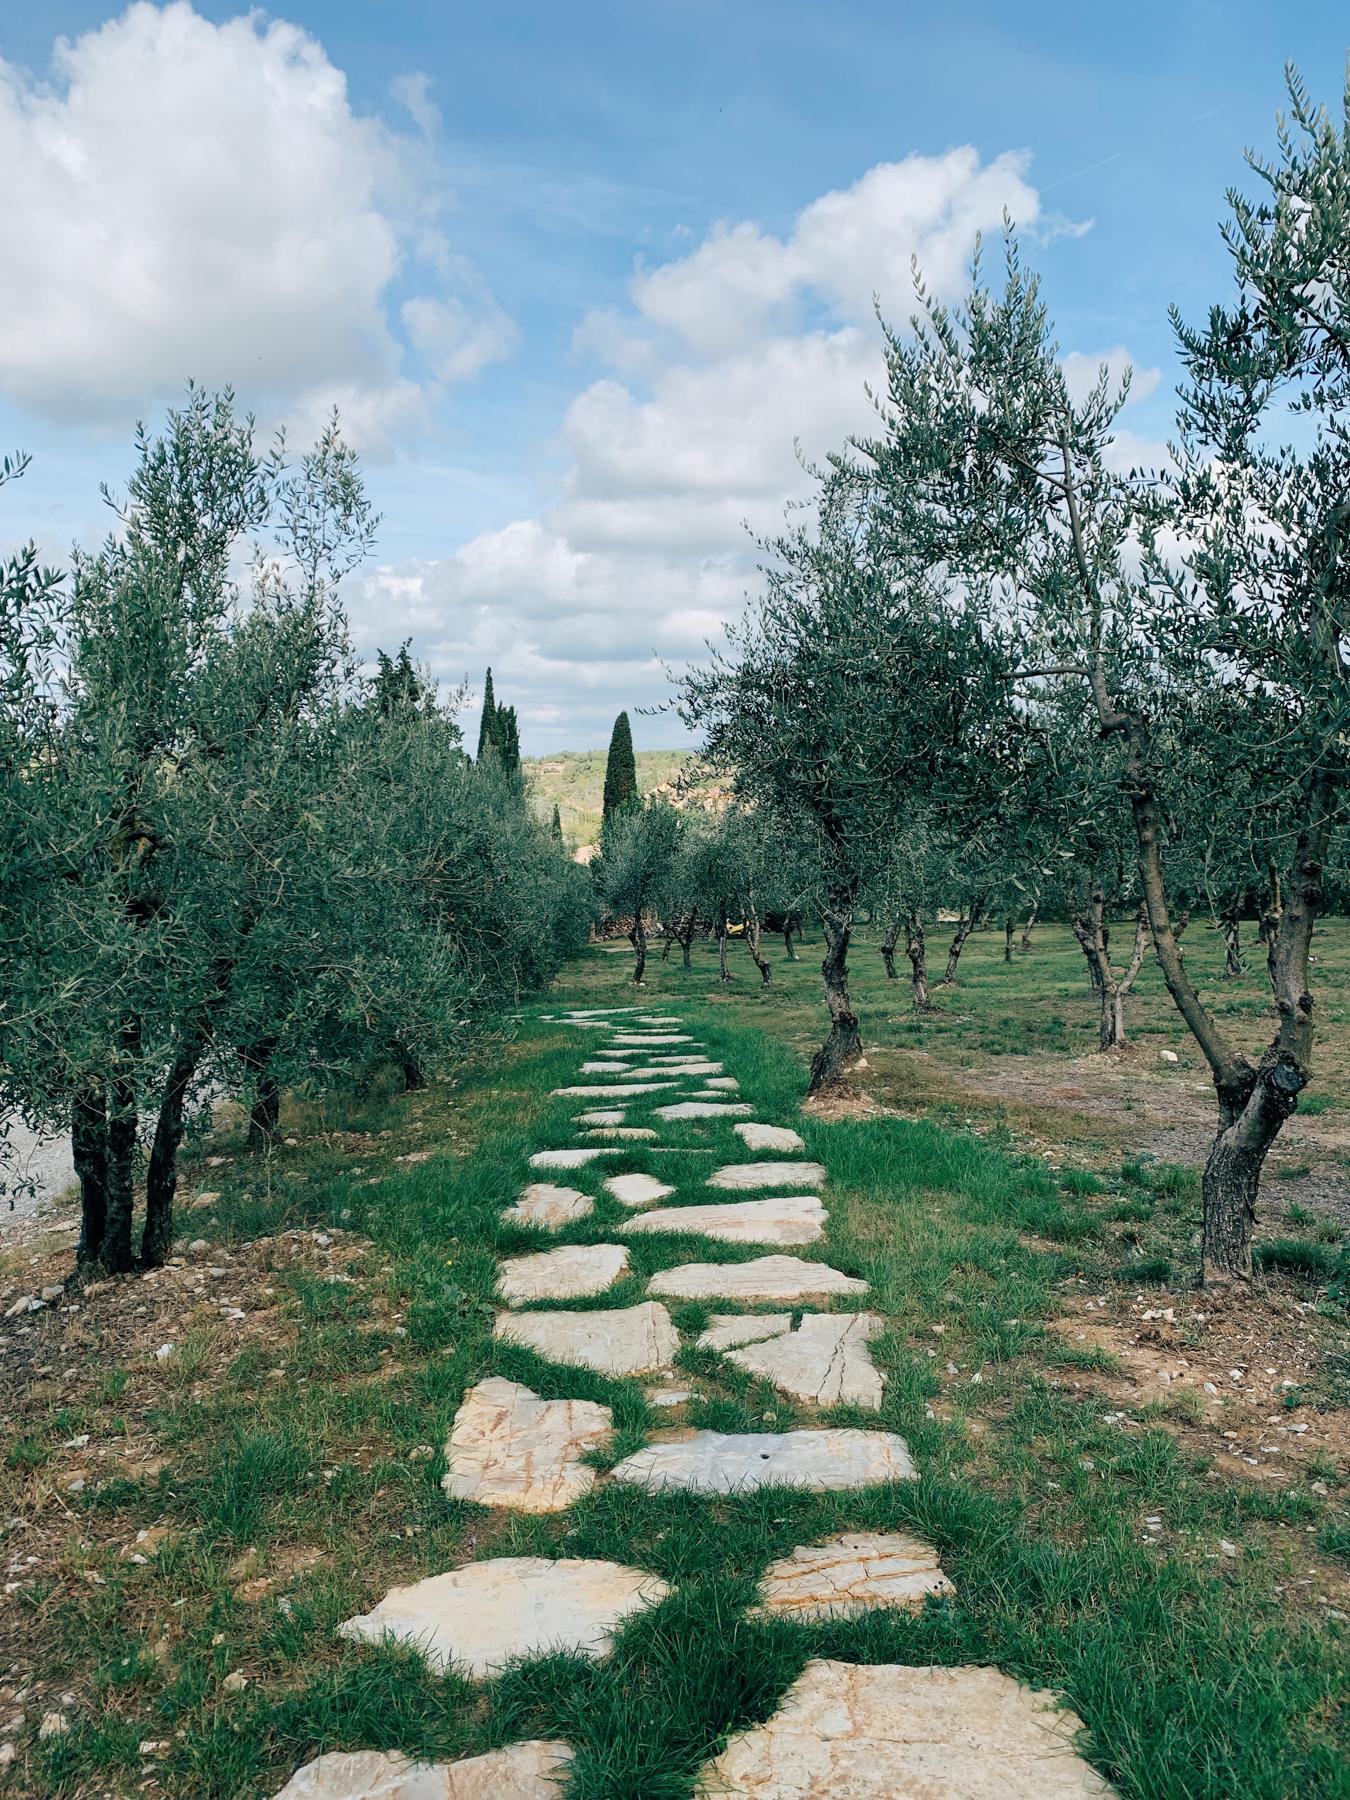 The path leading to the entrance of Castello di Ama.